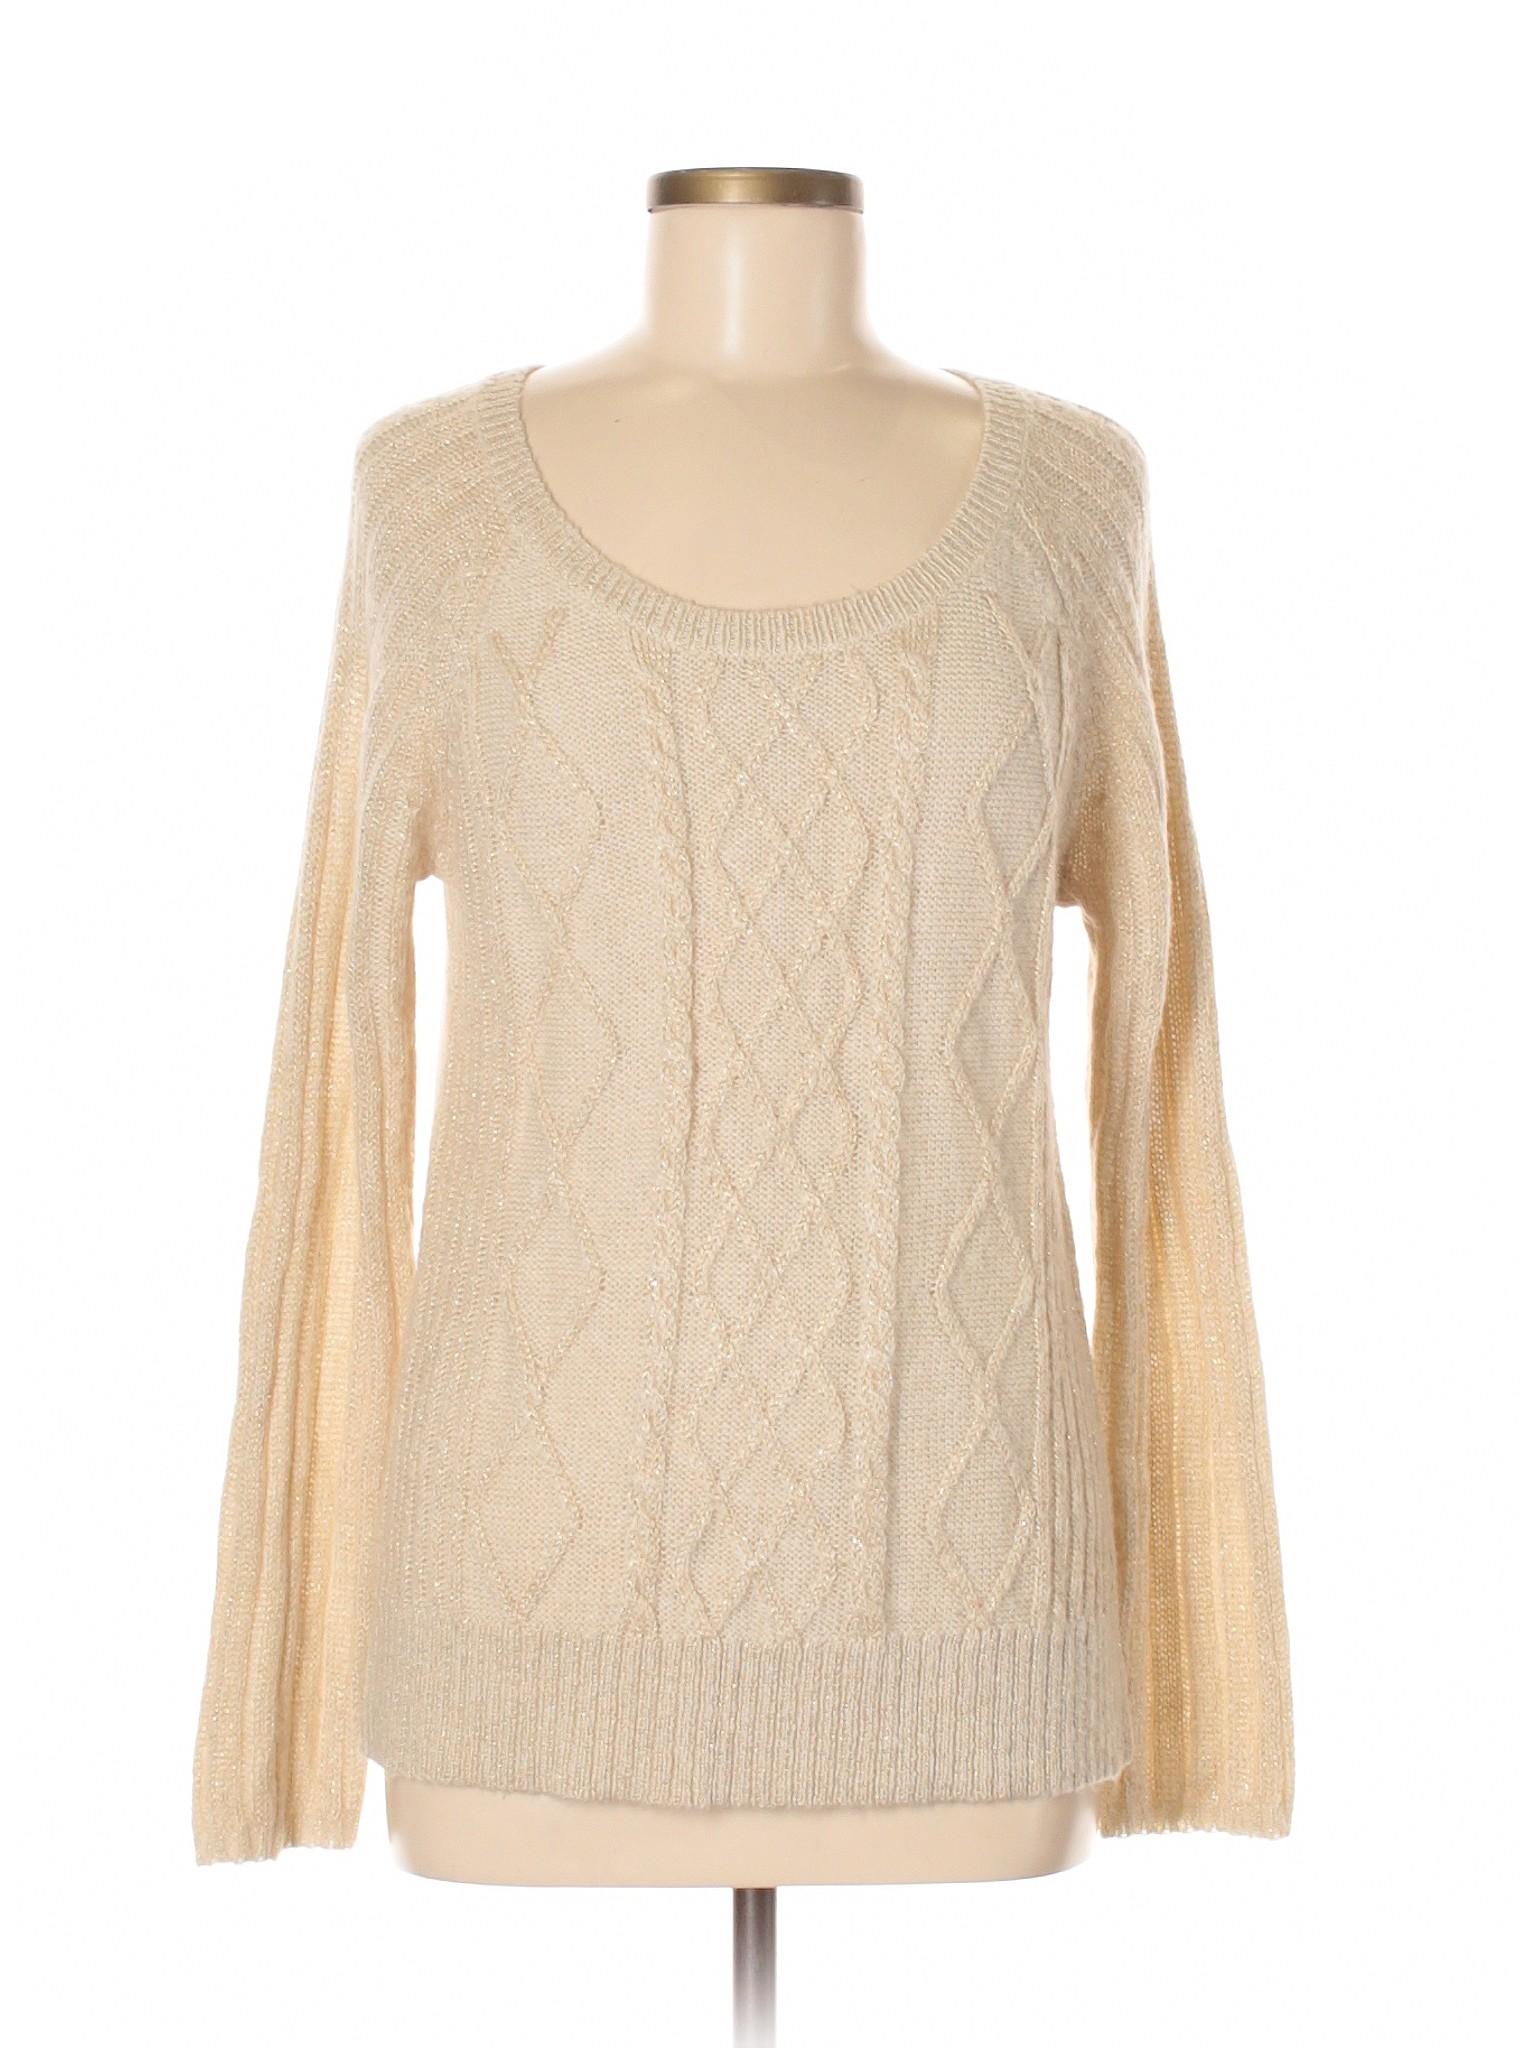 Sweater 9 Boutique Pullover Apt Winter wwqU8BOIf